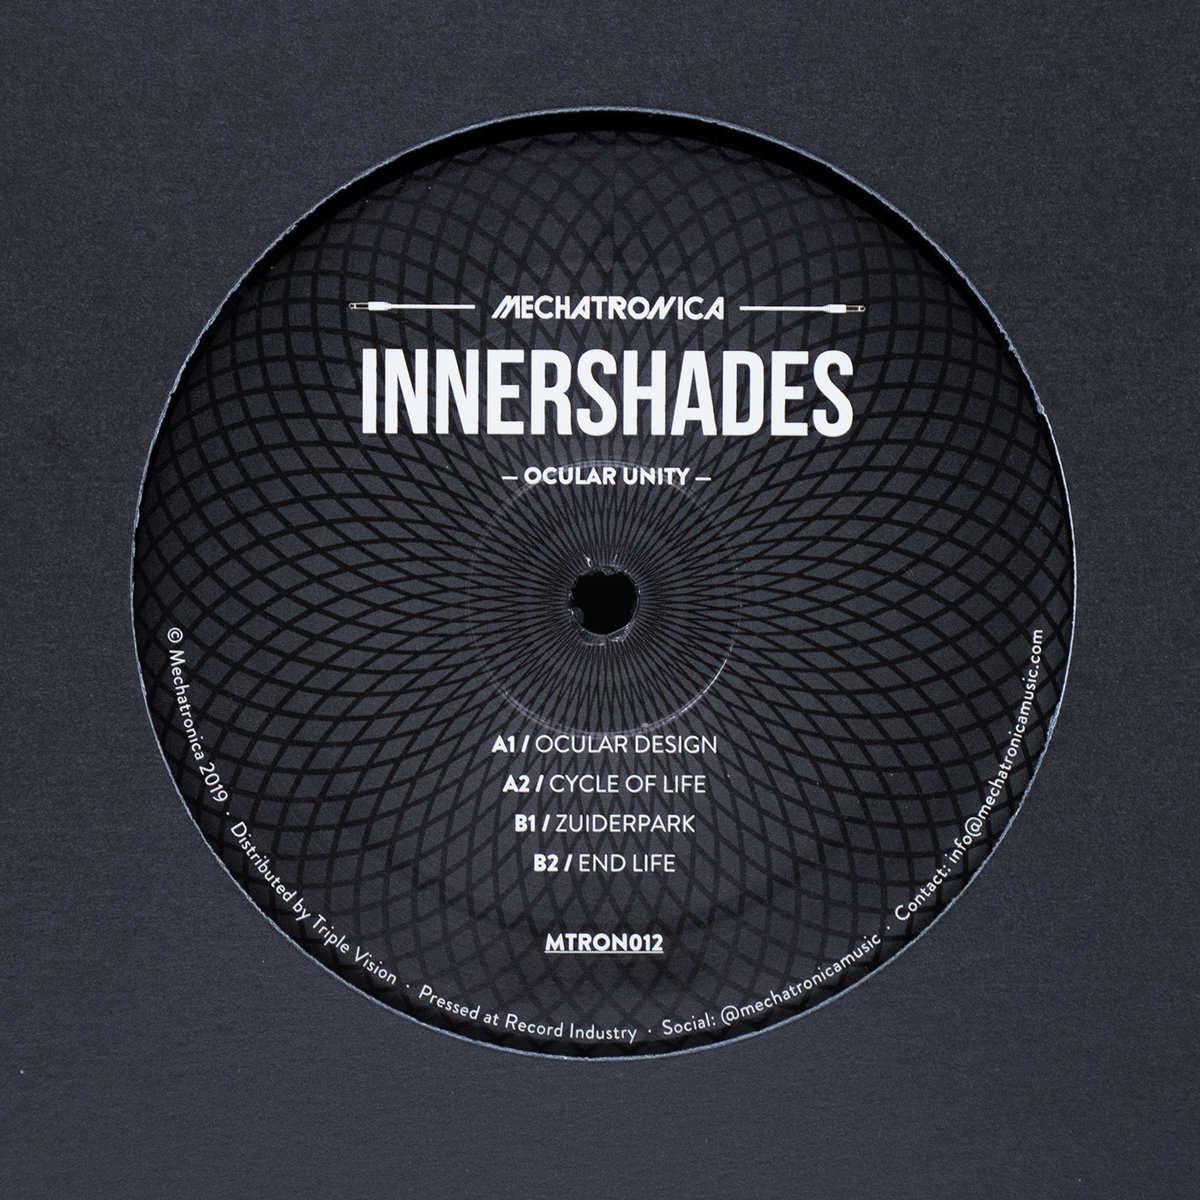 Innershades - Ocular Unity [Mechatronica] 2019